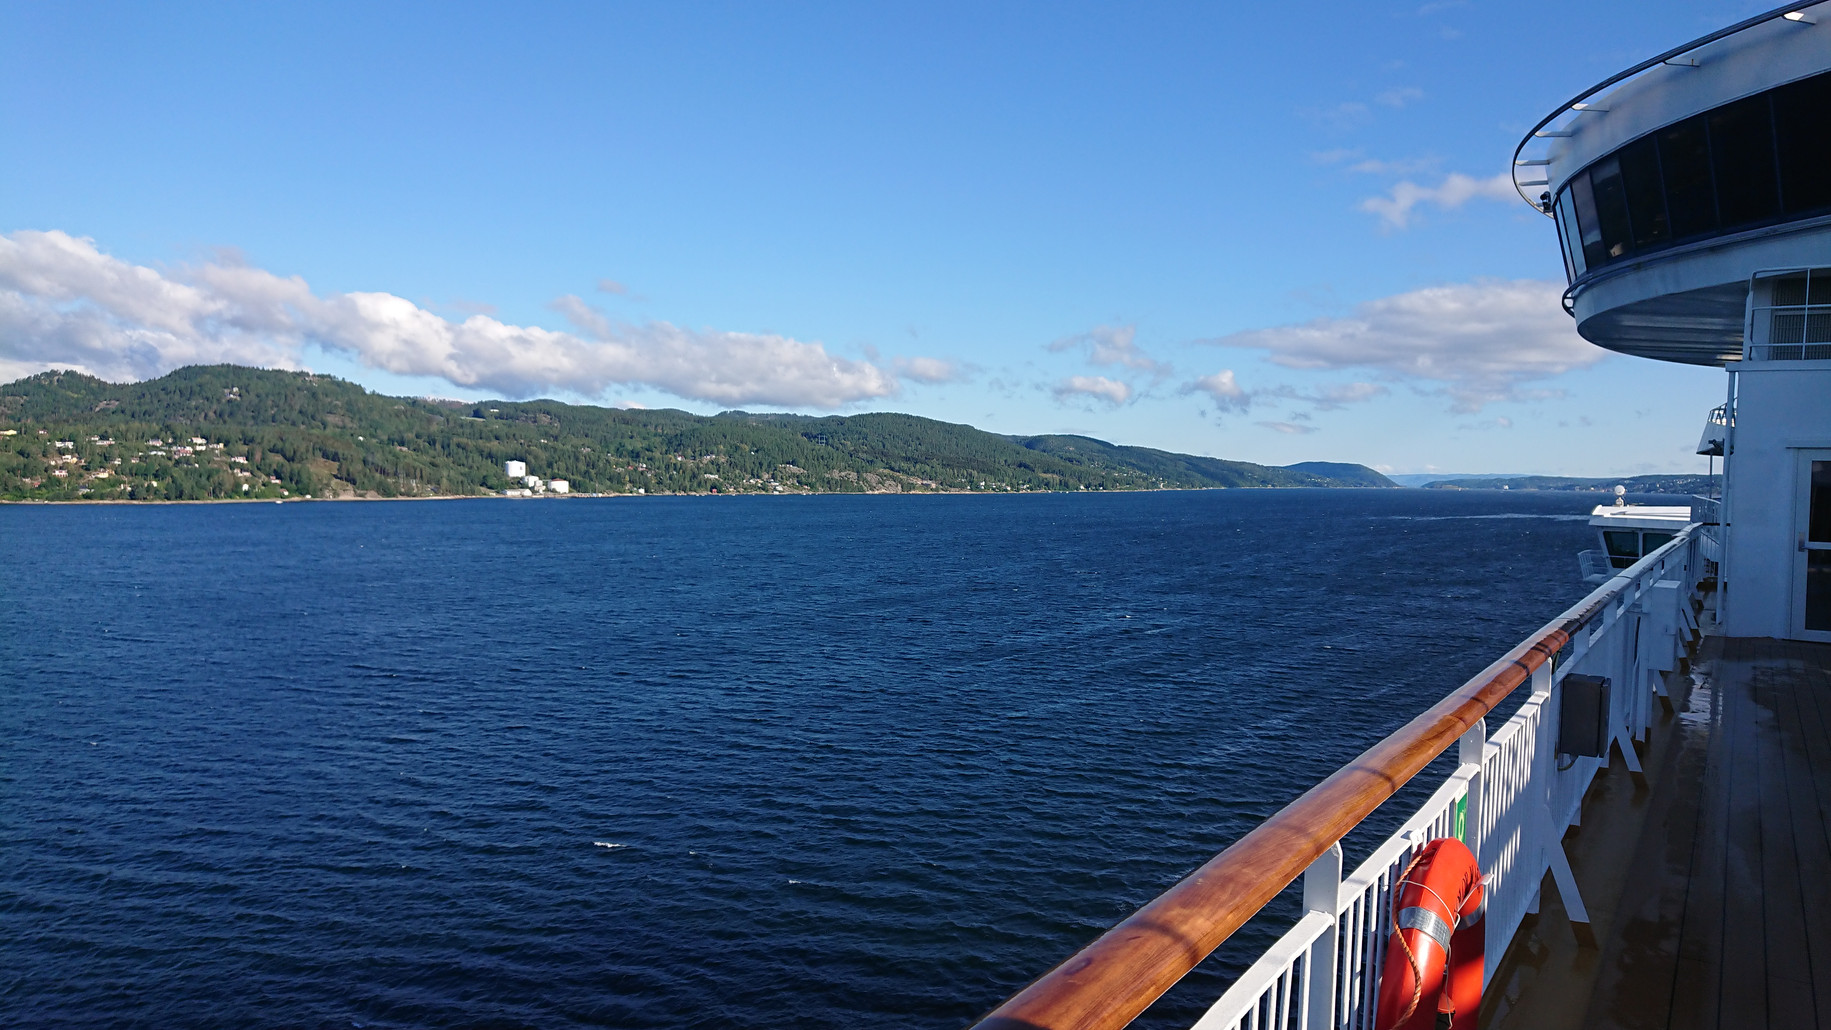 Ankunft in Oslo